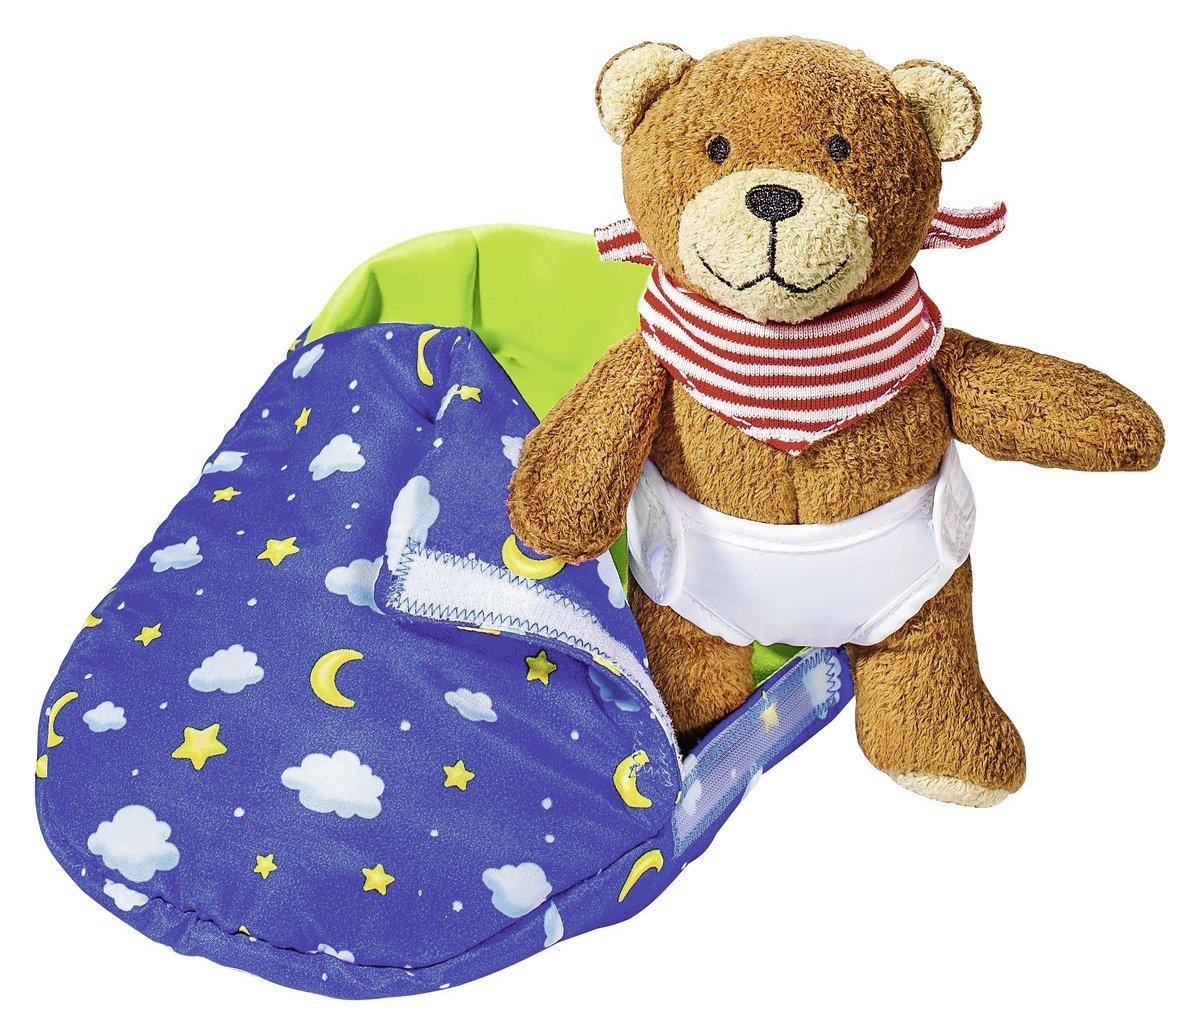 Teddy Bär im Schlafsack